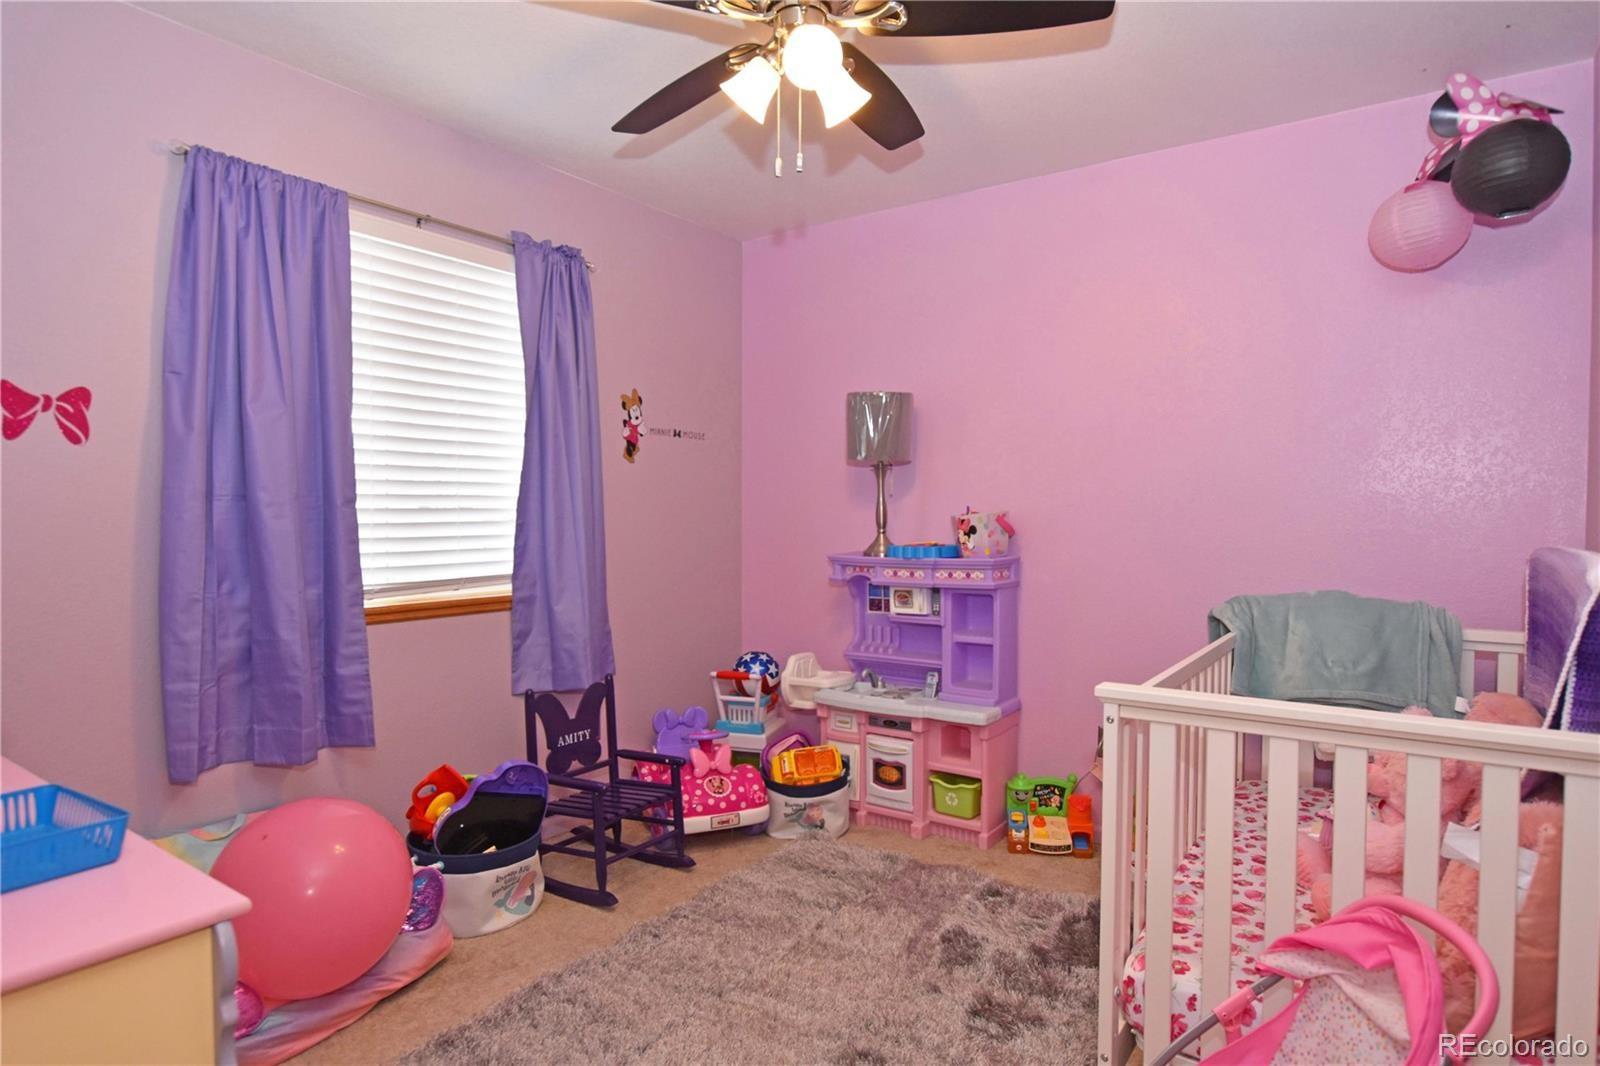 MLS# 9206879 - 28 - 3924 Eagles Nest Drive, Evans, CO 80620